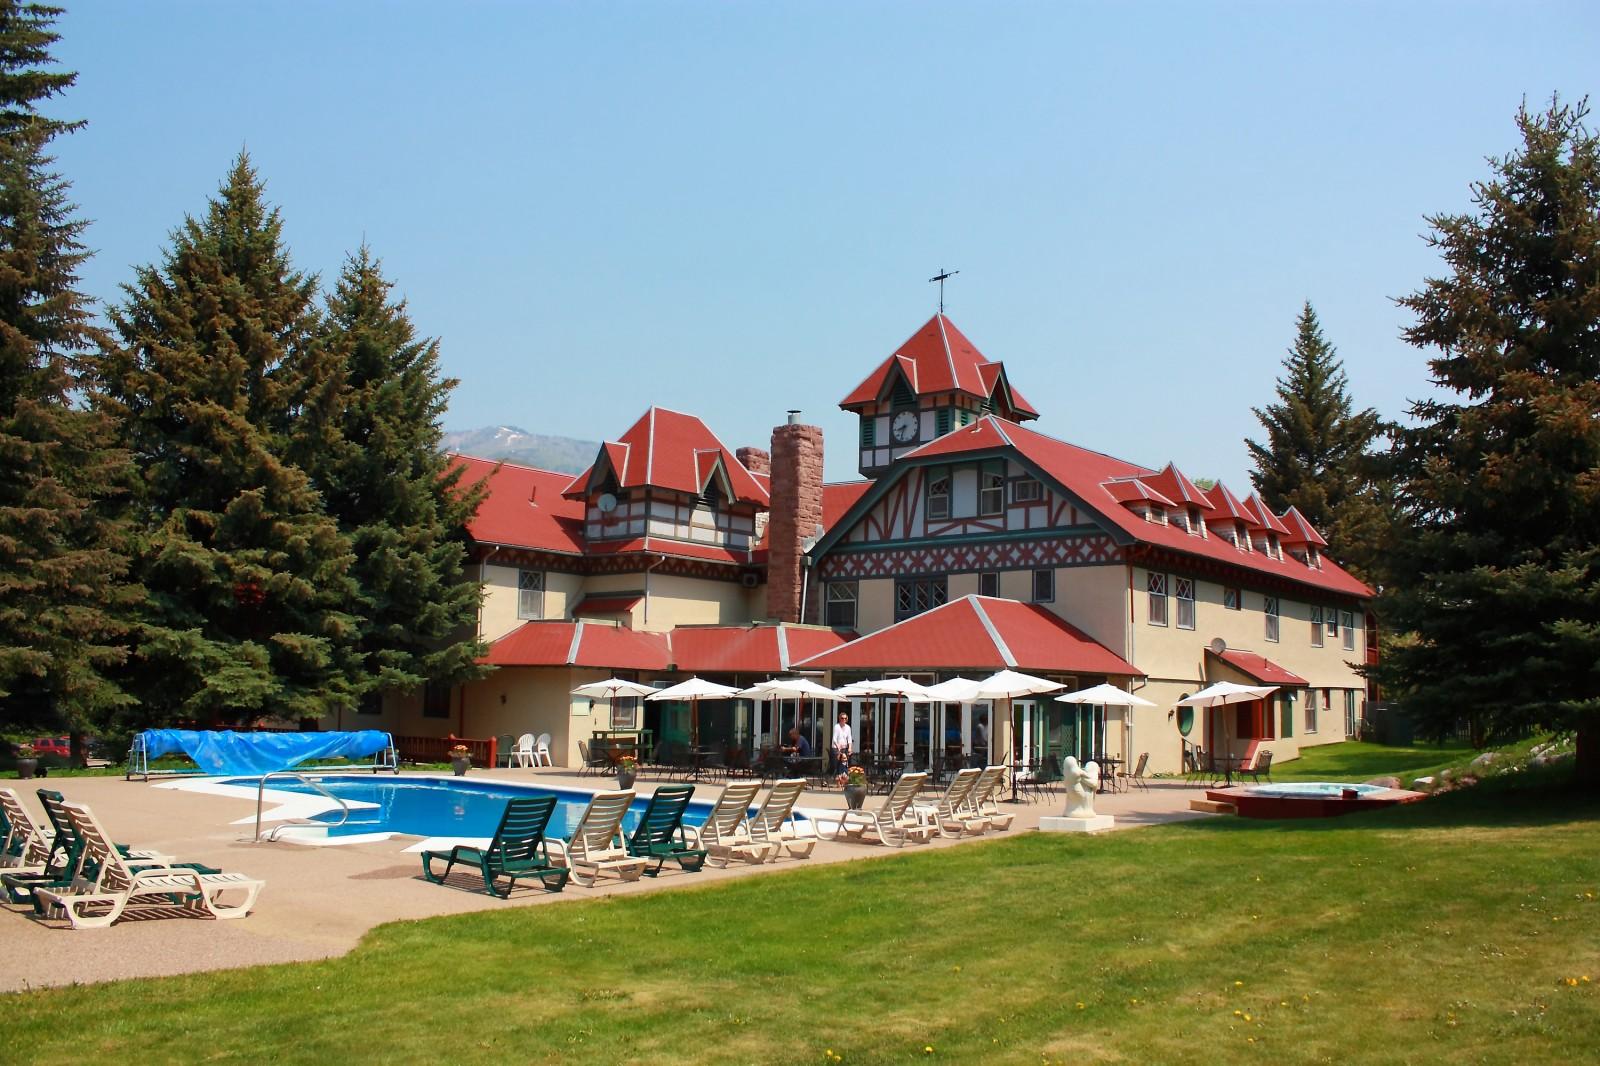 Redstone Inn Pool